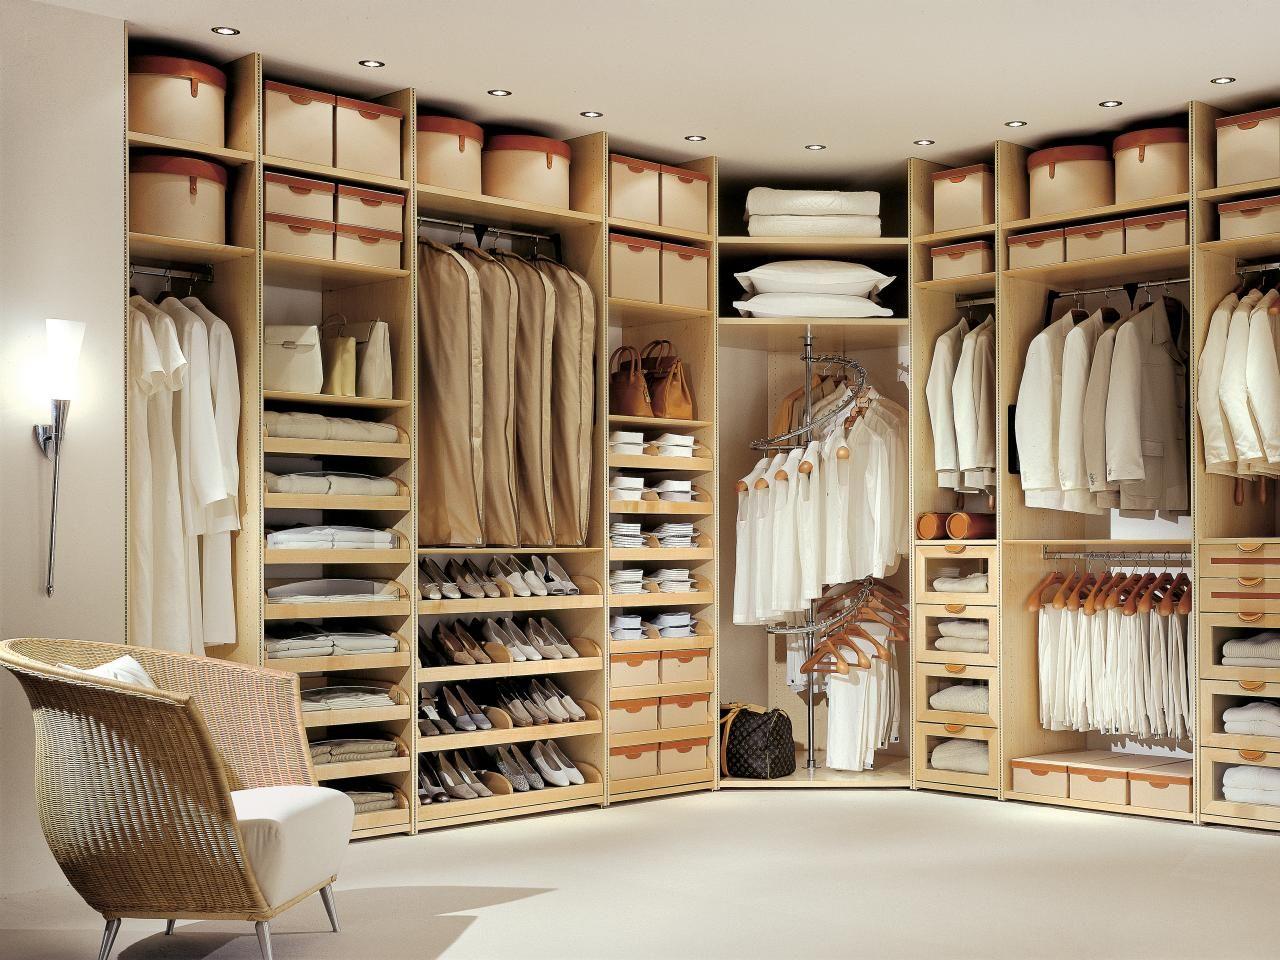 Walk-In Closet Design Ideas | Remodeling ideas, Hgtv and Wardrobe ...